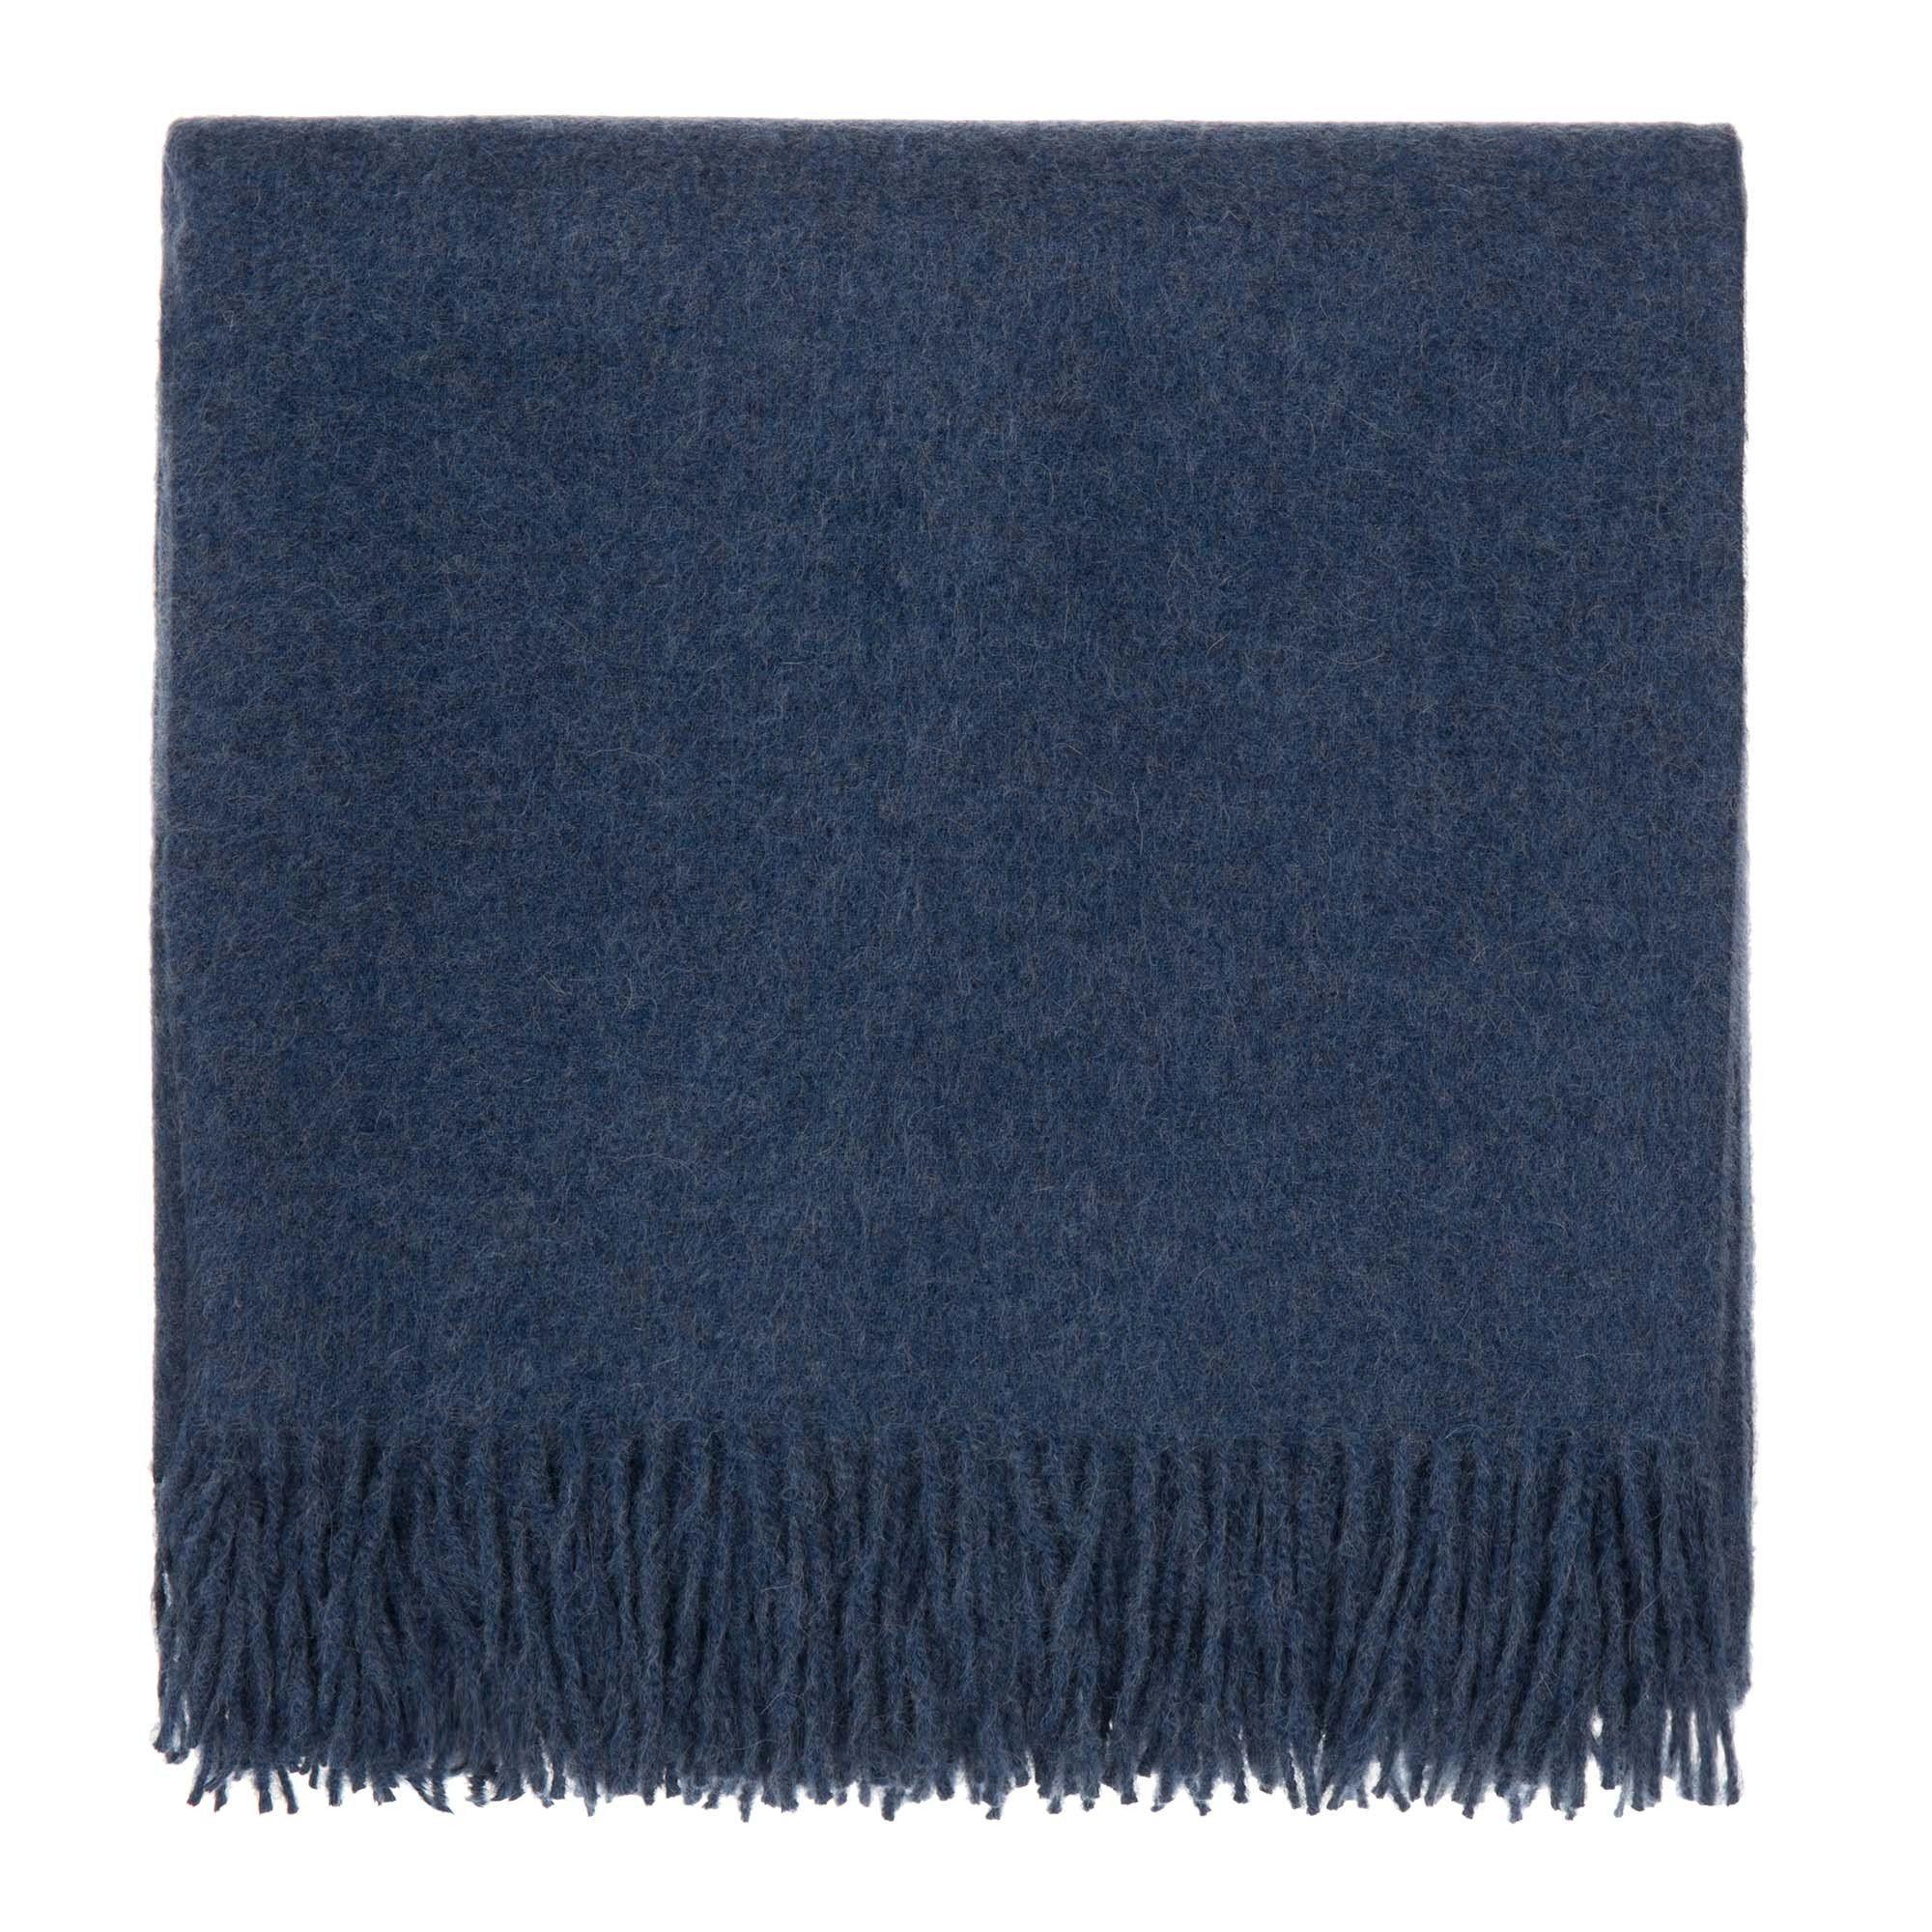 Alpakadecke Arica Jeansblau 130x185 Cm Alpaka Decke Urbanara